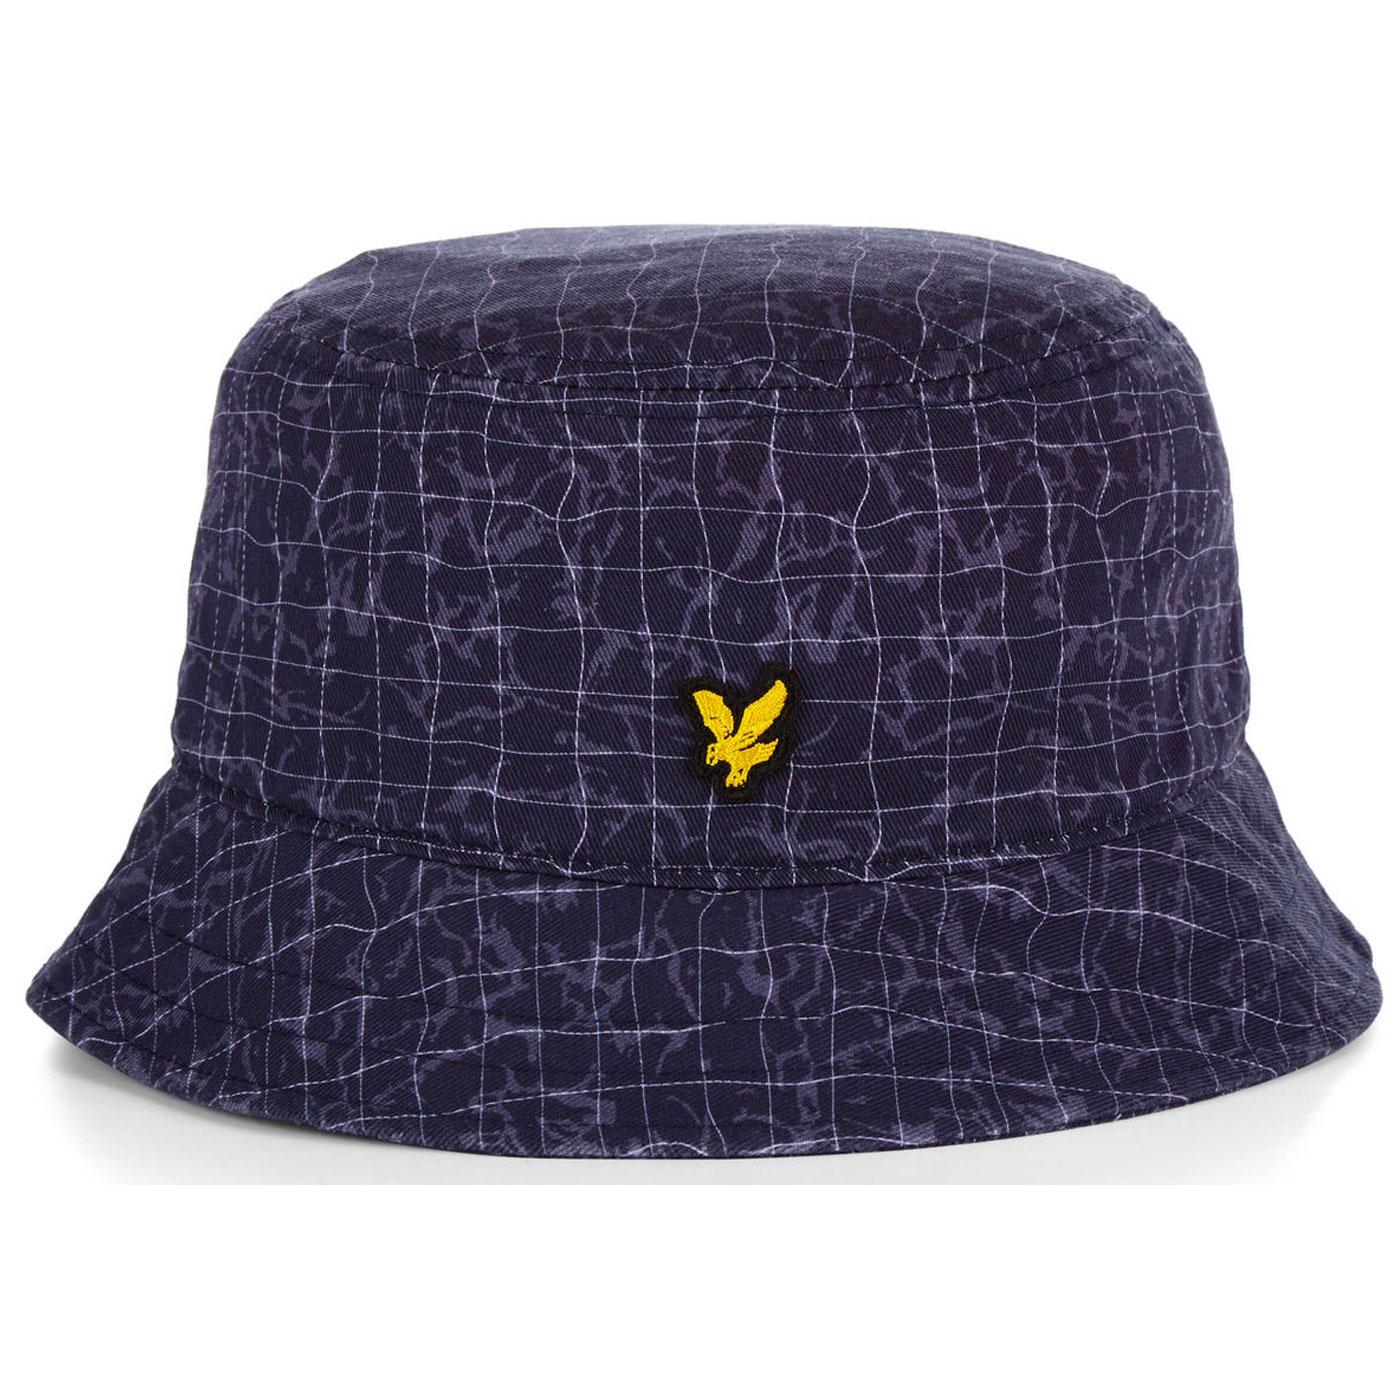 LYLE & SCOTT Retro 90s Pool Print Bucket Hat NAVY